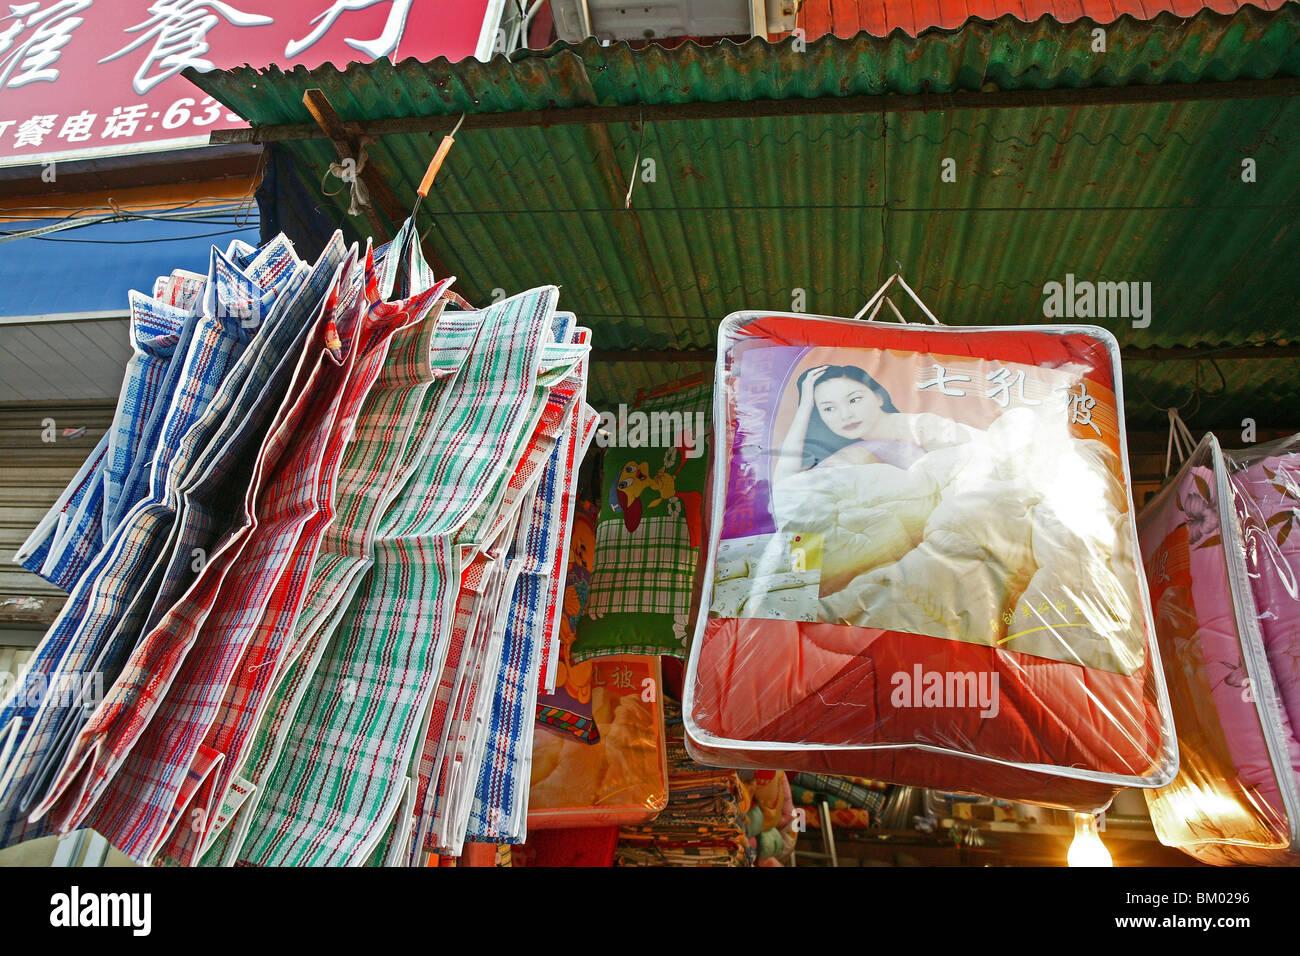 Stock Photo   Clothes Market Huaihai, Plastic Bag, Carry Bag, Open Door  Cloth Market